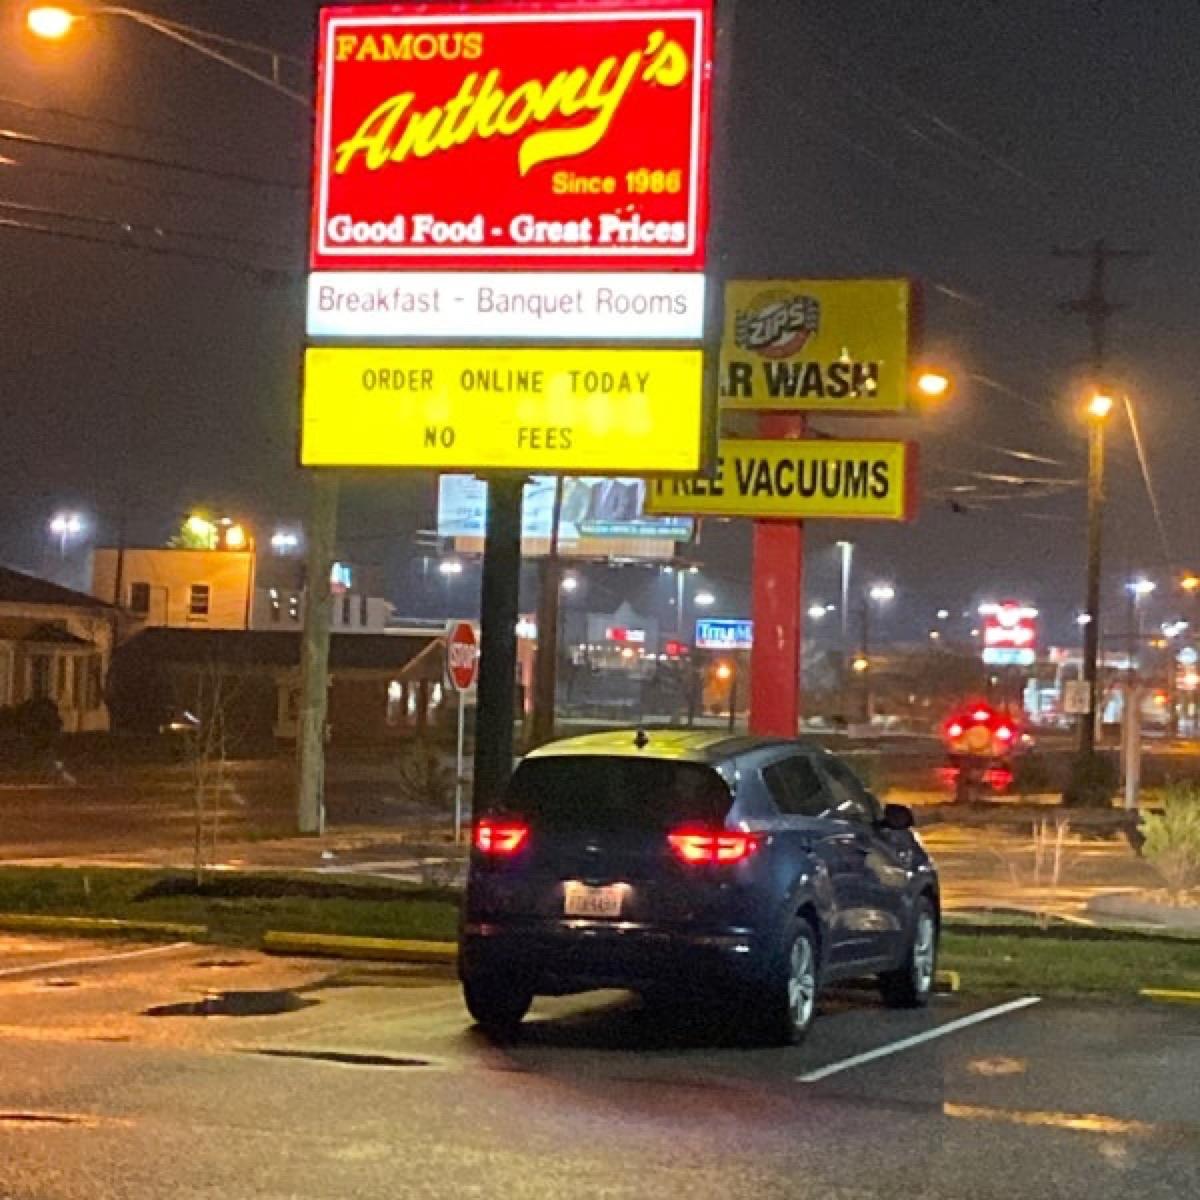 exterior shot of illuminated sign at famous anthonys restaurant at night